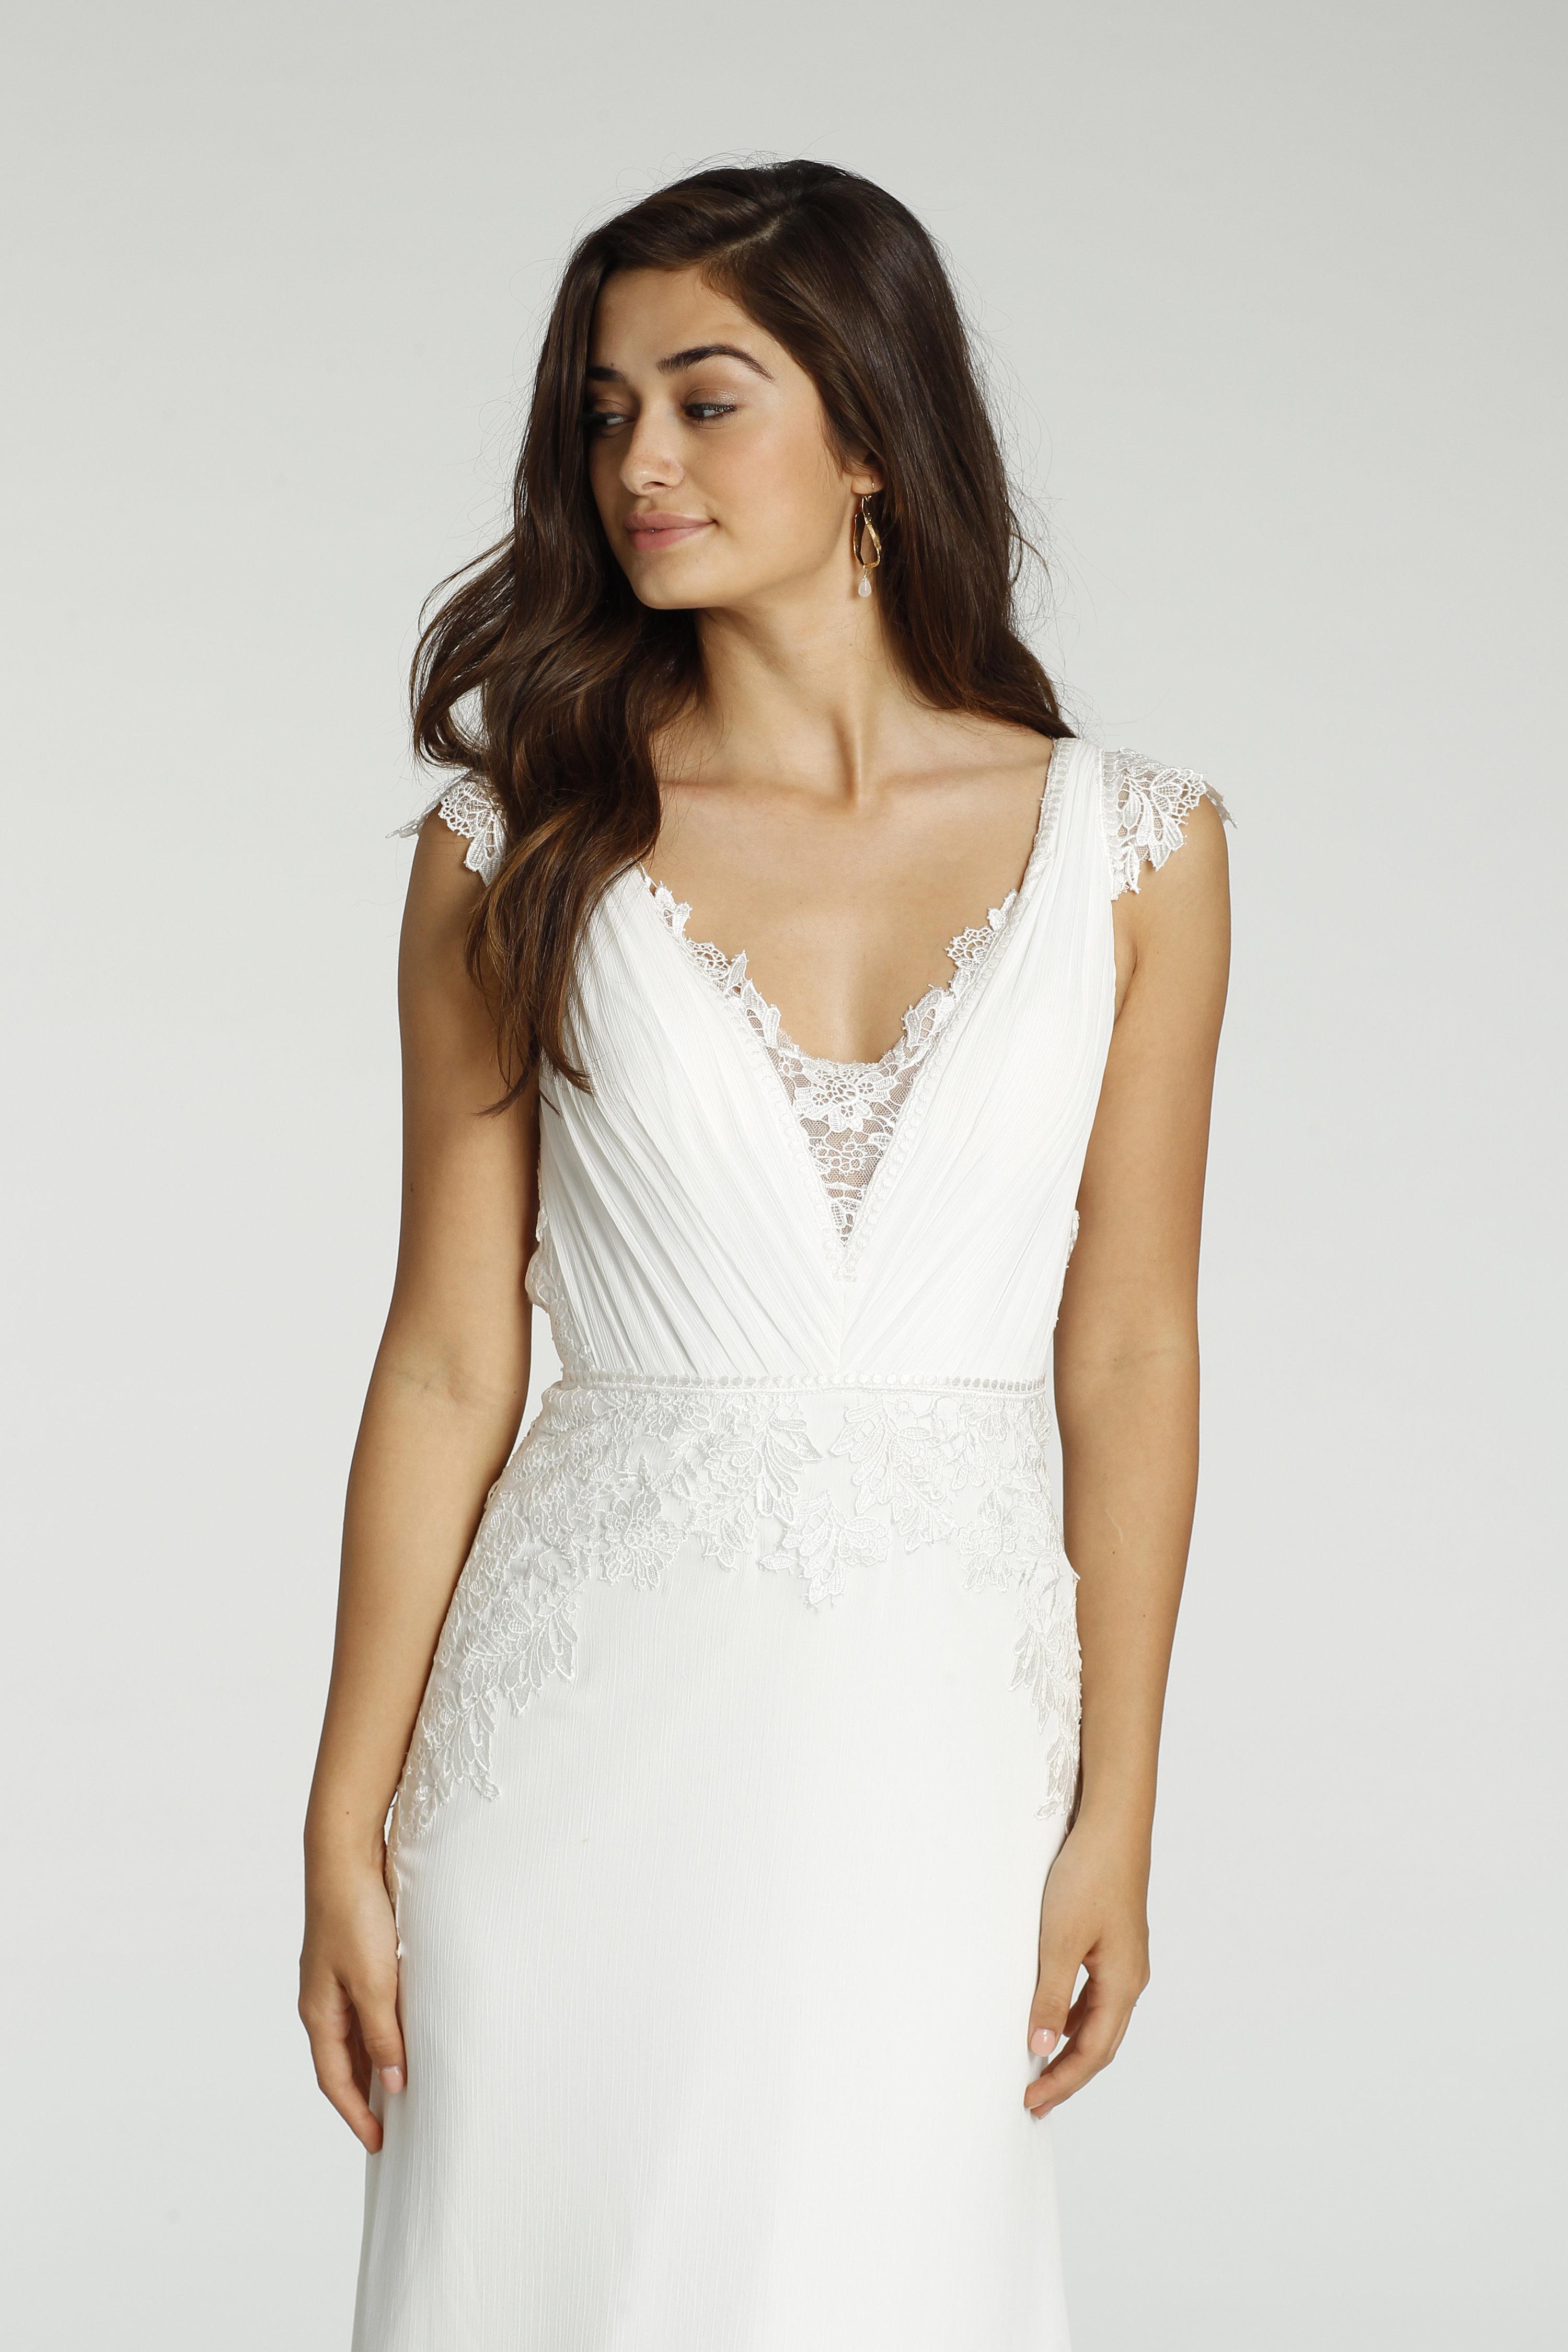 Seventies Bridal Trends to Make Any Boho Bride Happy - K & B Bridals